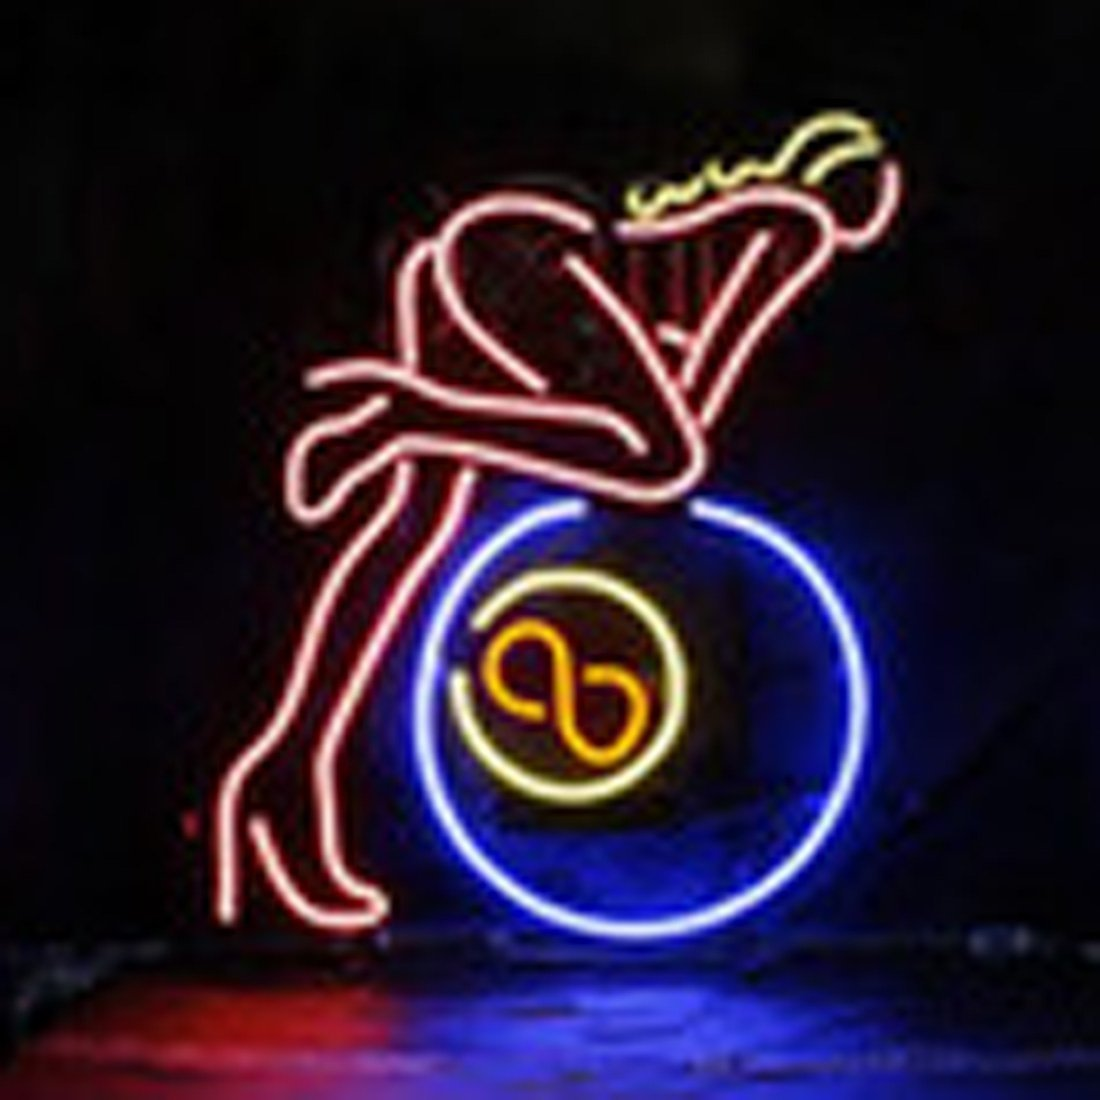 Urby™ 17''x14'' Open Sexy Lady Custom Handmade Glass Tube Neon Light Sign 3-Year Warranty-Unique Artwork! UA22 by Urby